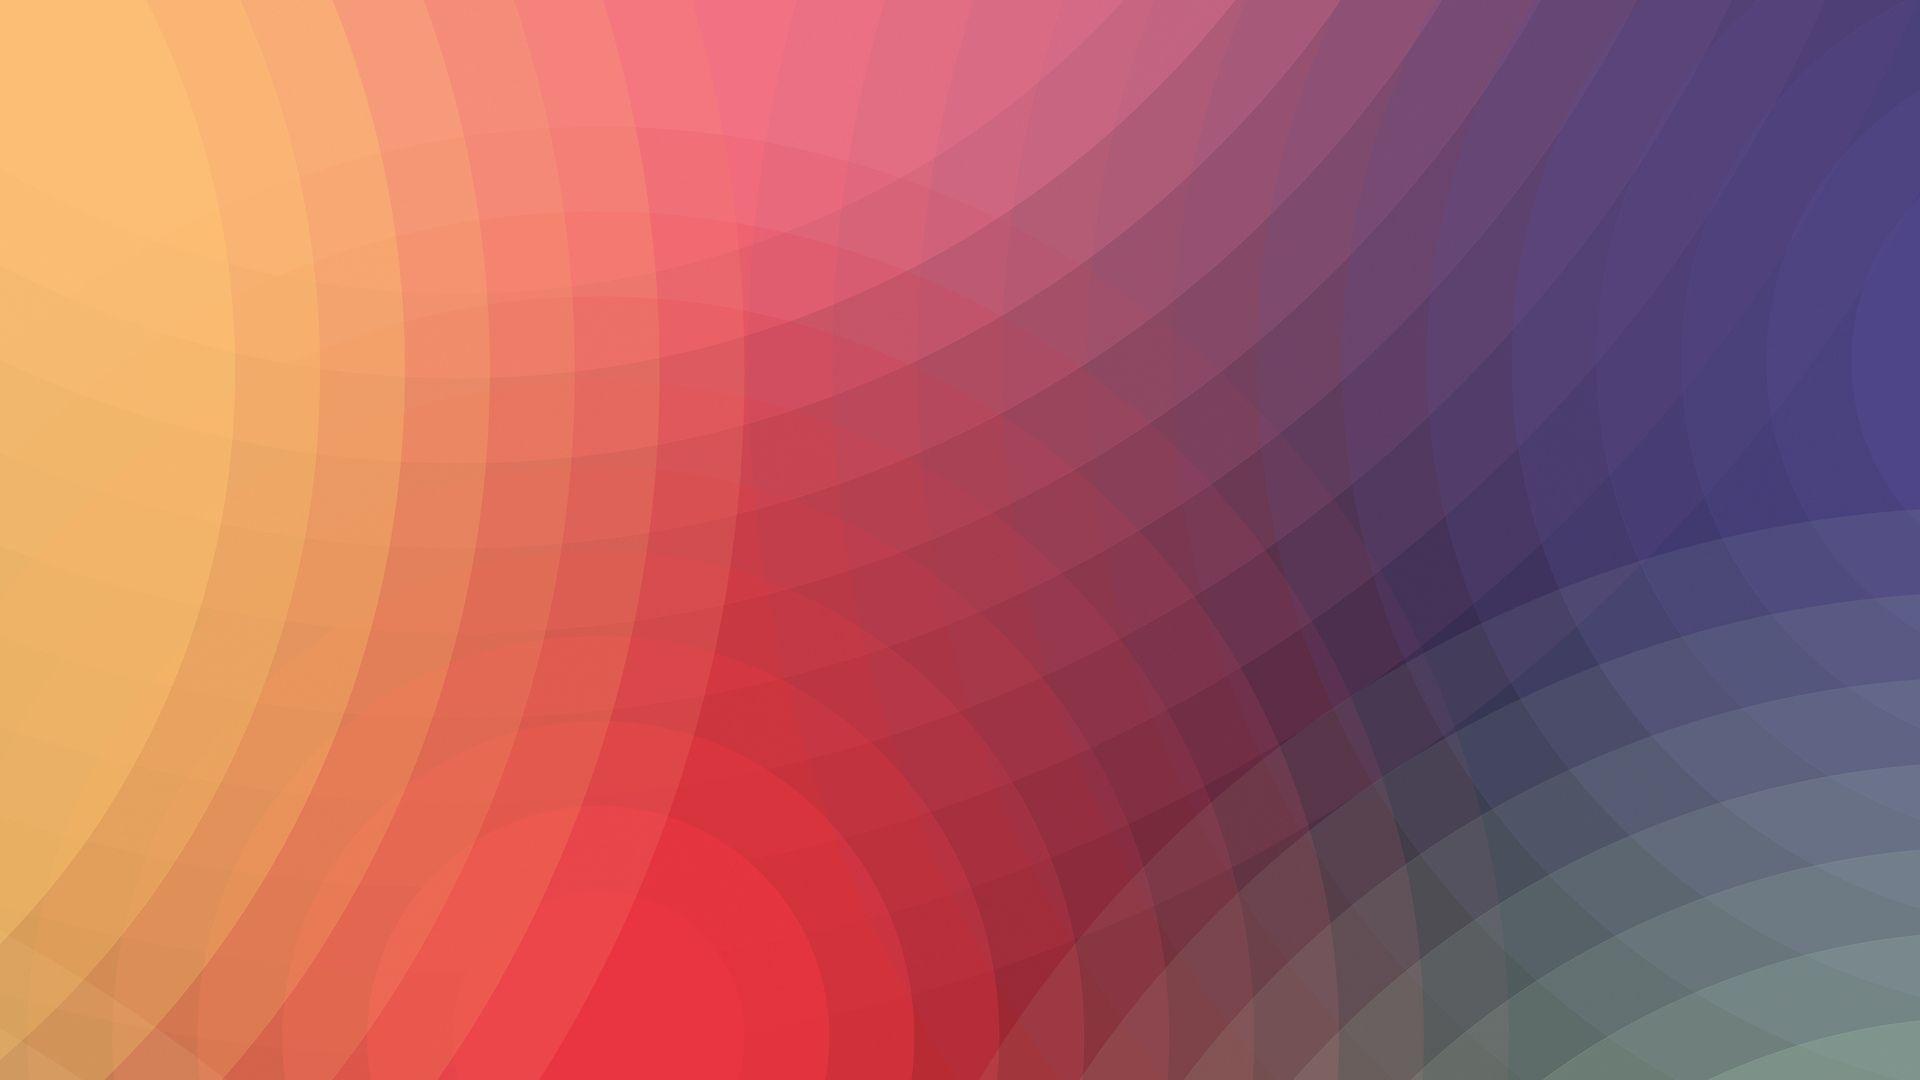 Soft hd wallpaper 1080